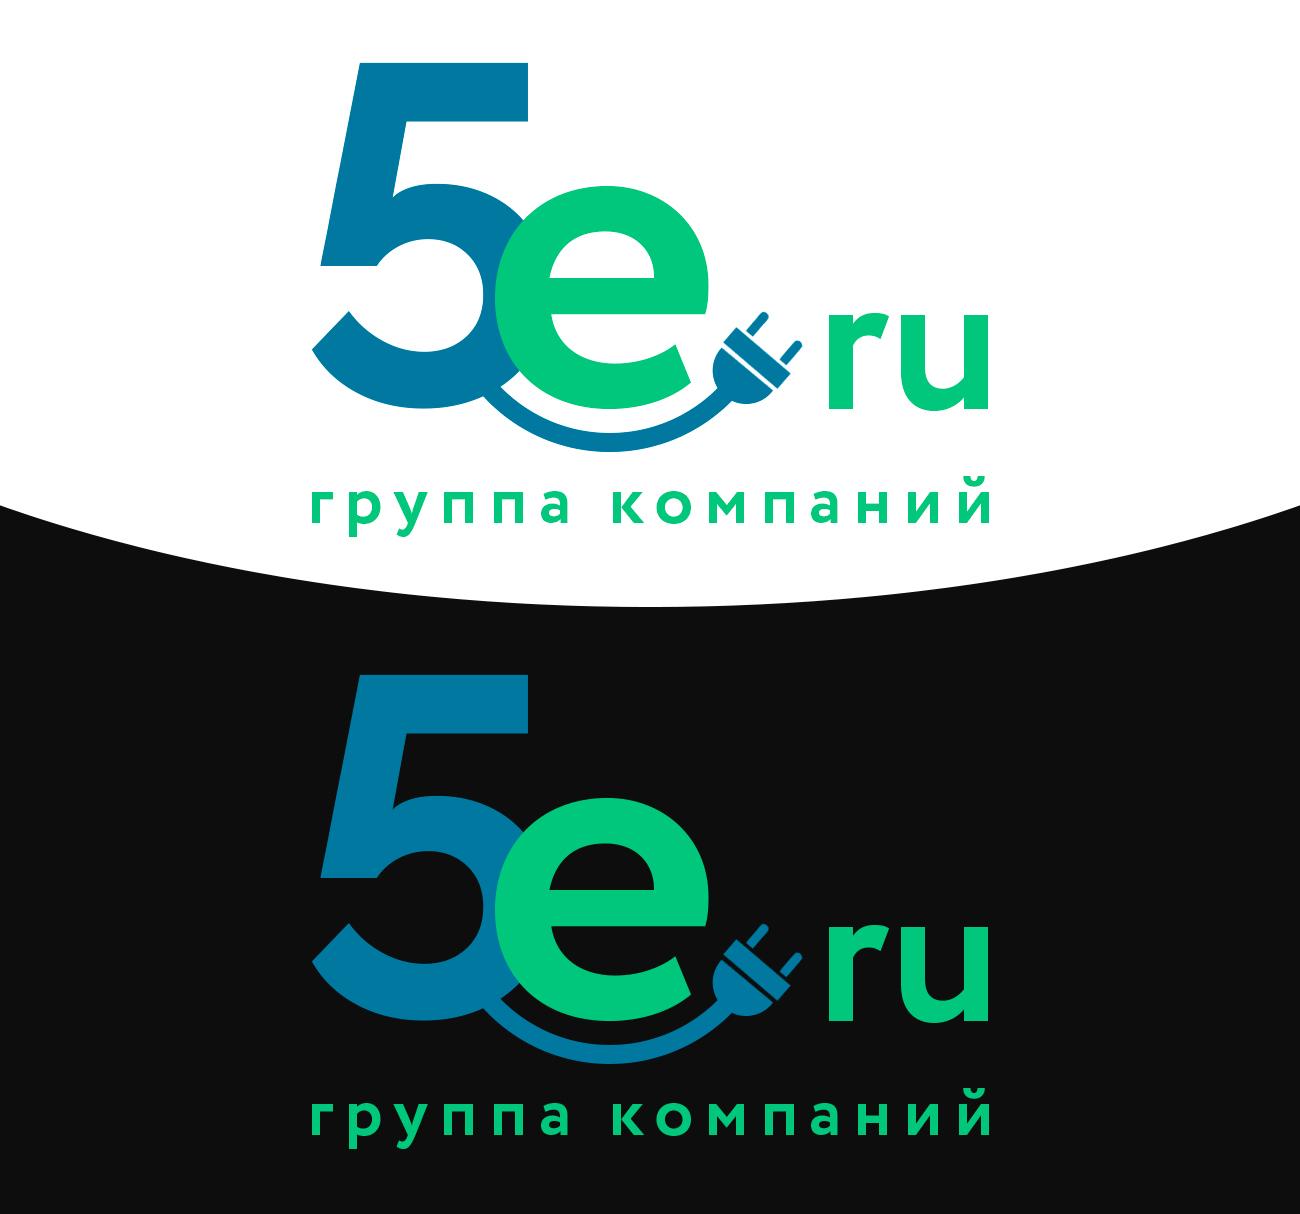 Нарисовать логотип для группы компаний  фото f_6375cdc6a2e2bfa9.jpg